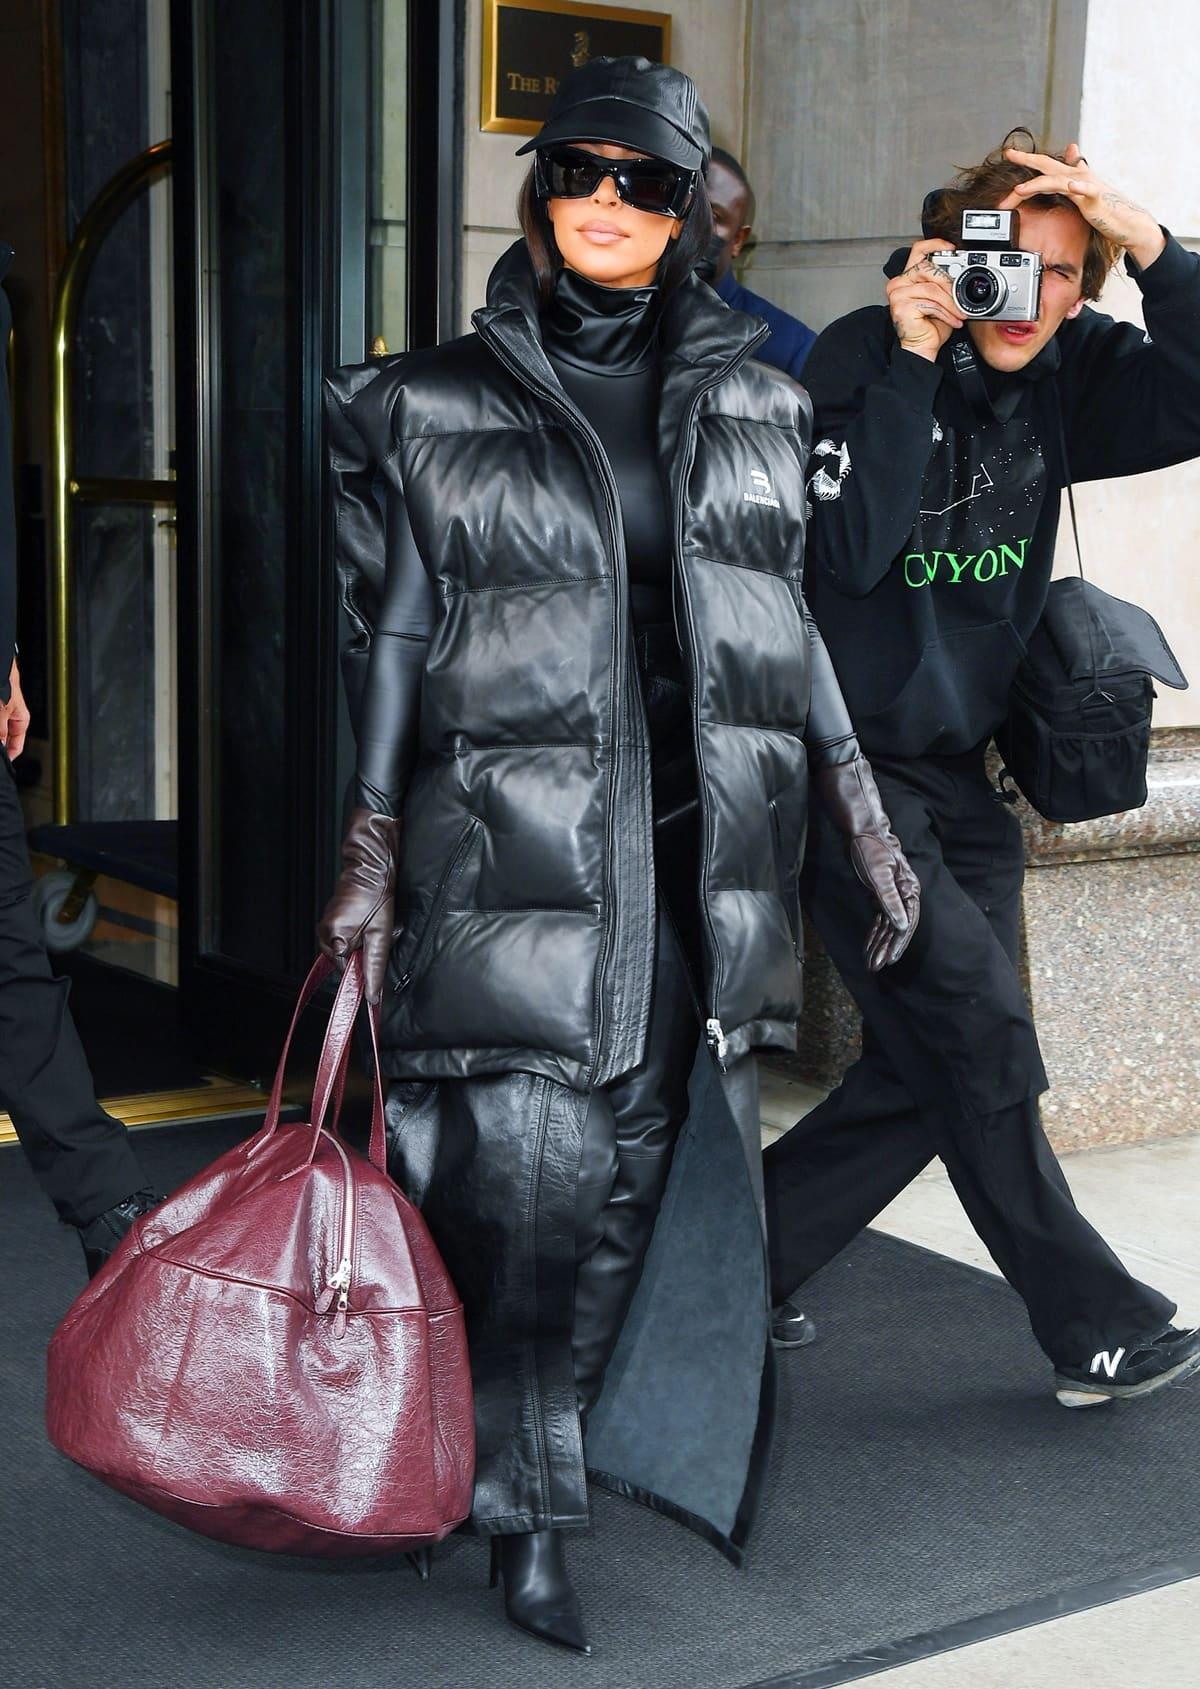 Kim Kardashian in a very Judge Dredd inspired look despite the hot muggy NYC heat